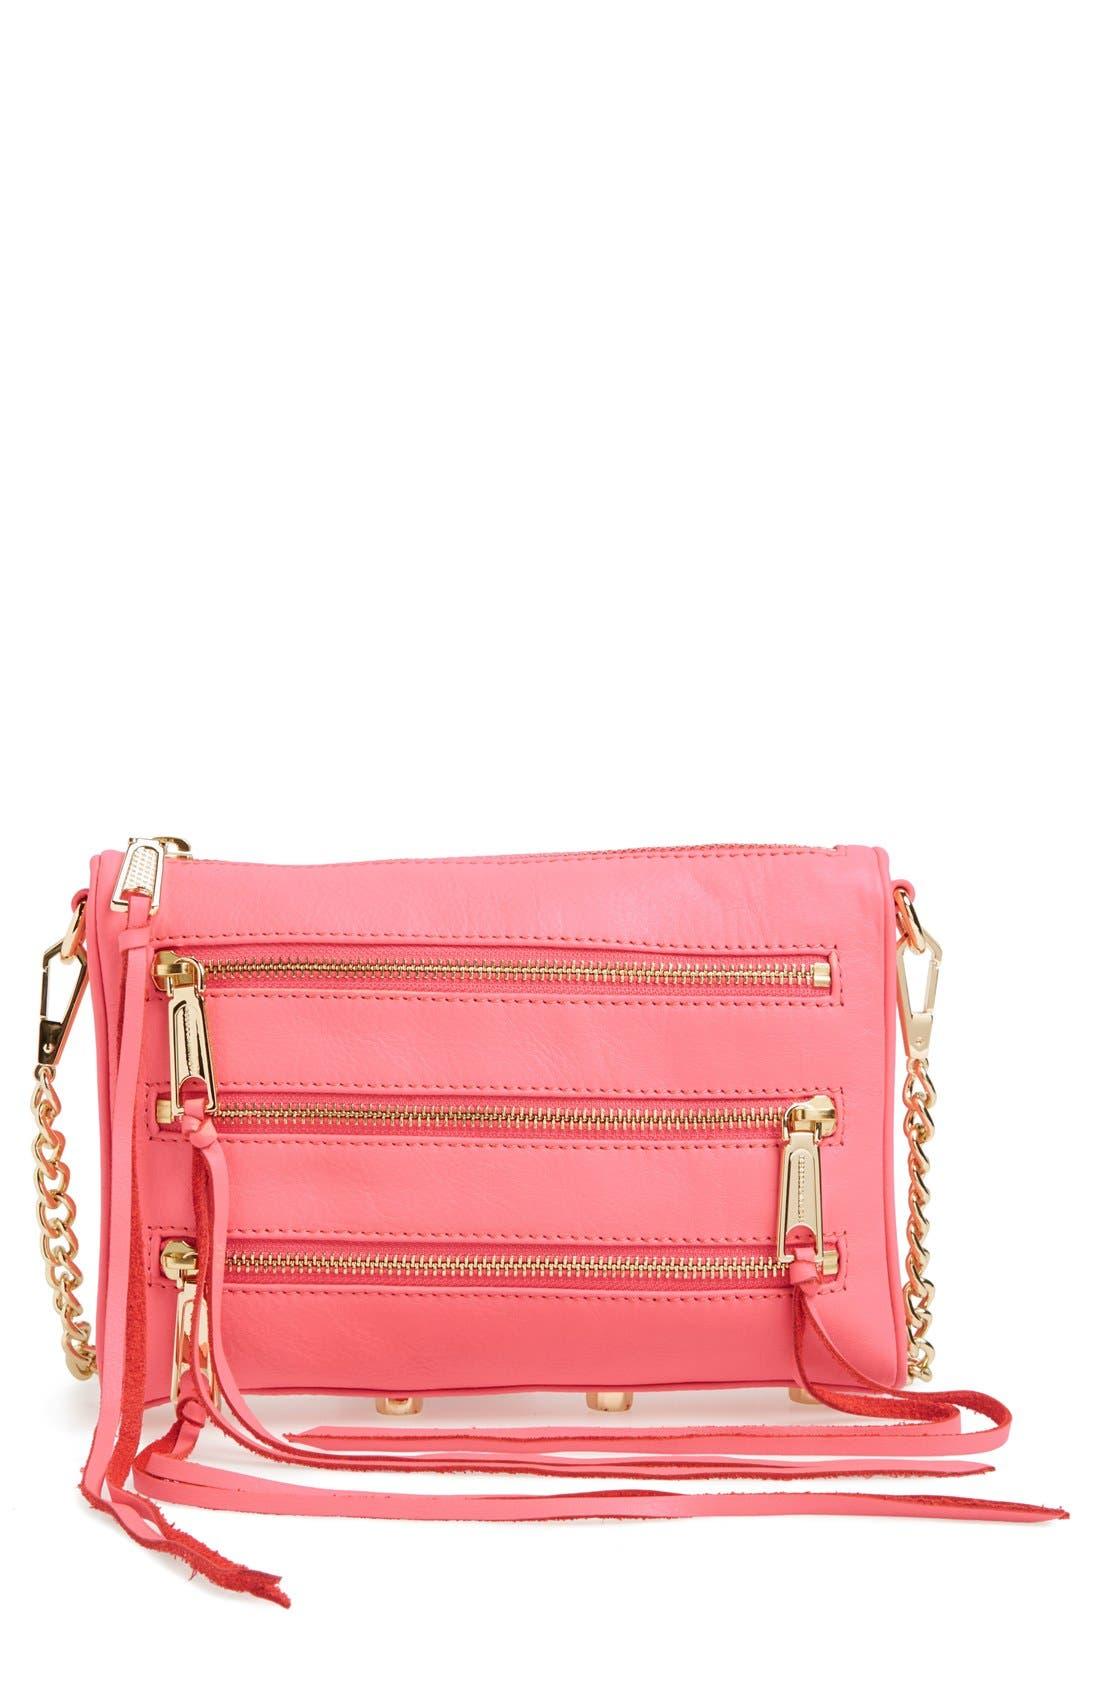 Alternate Image 1 Selected - Rebecca Minkoff 'Mini 5 Zip' Convertible Crossbody Bag